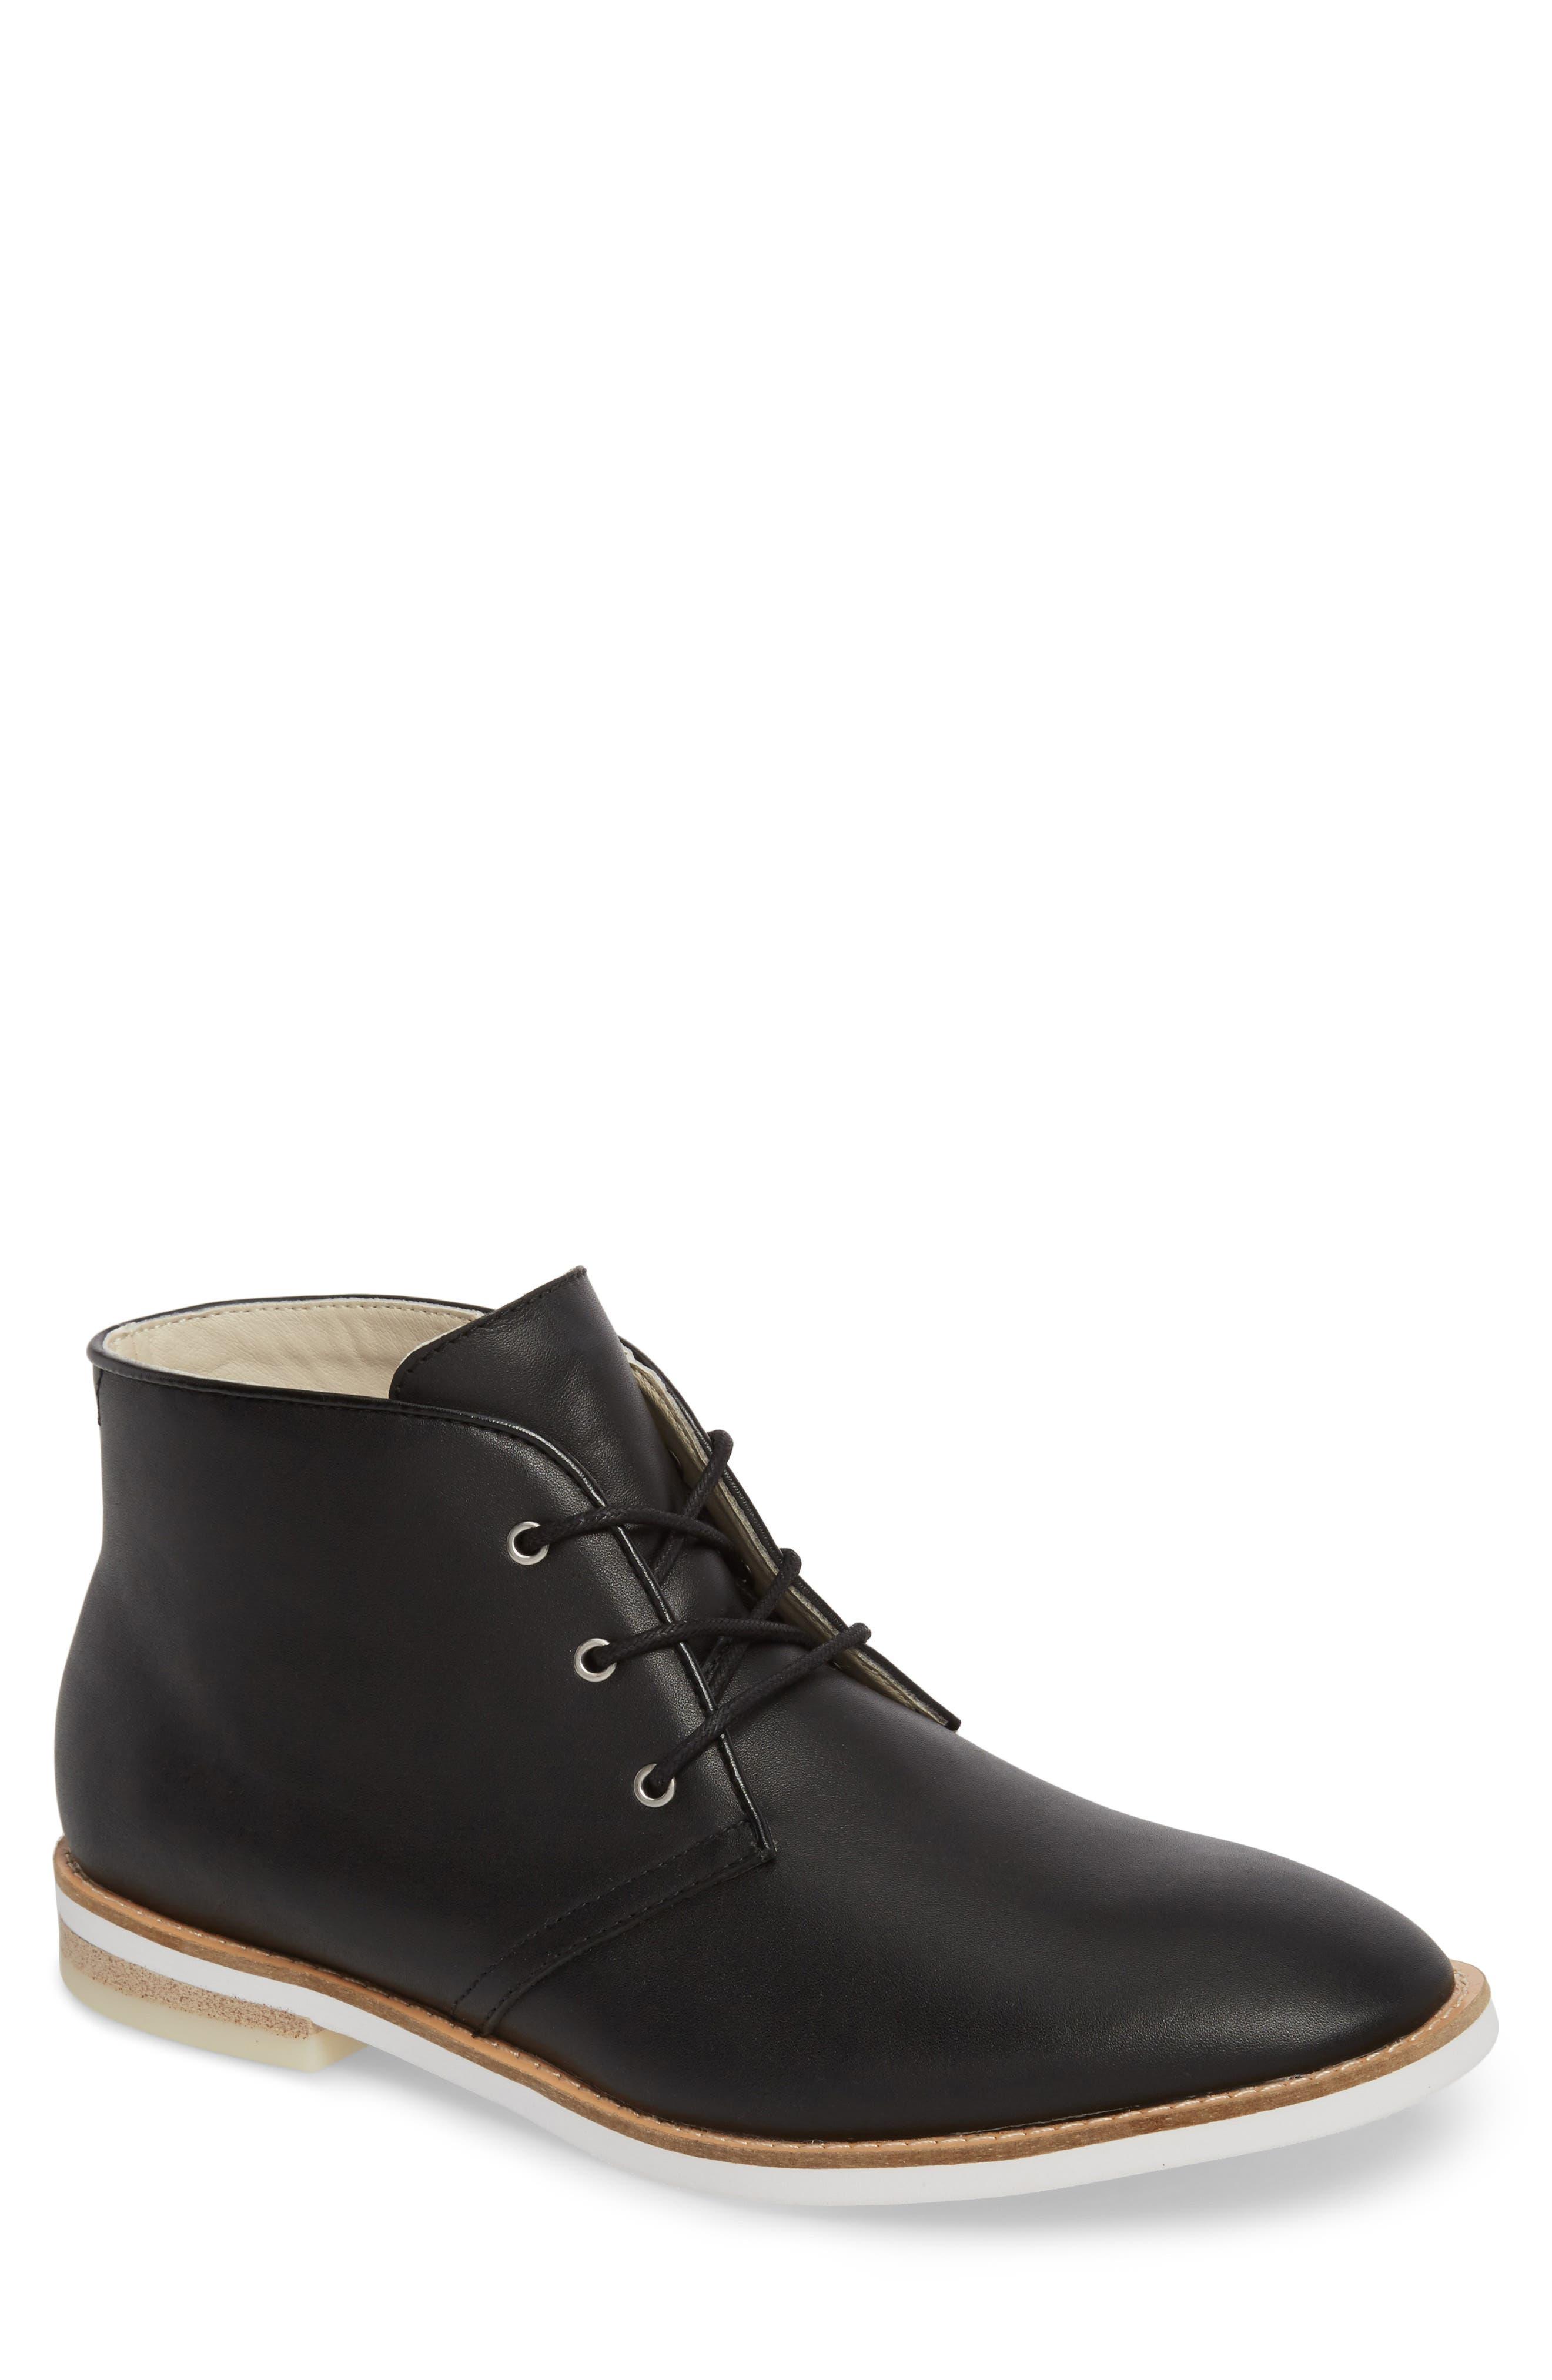 Albe Chukka Boot,                         Main,                         color, 001